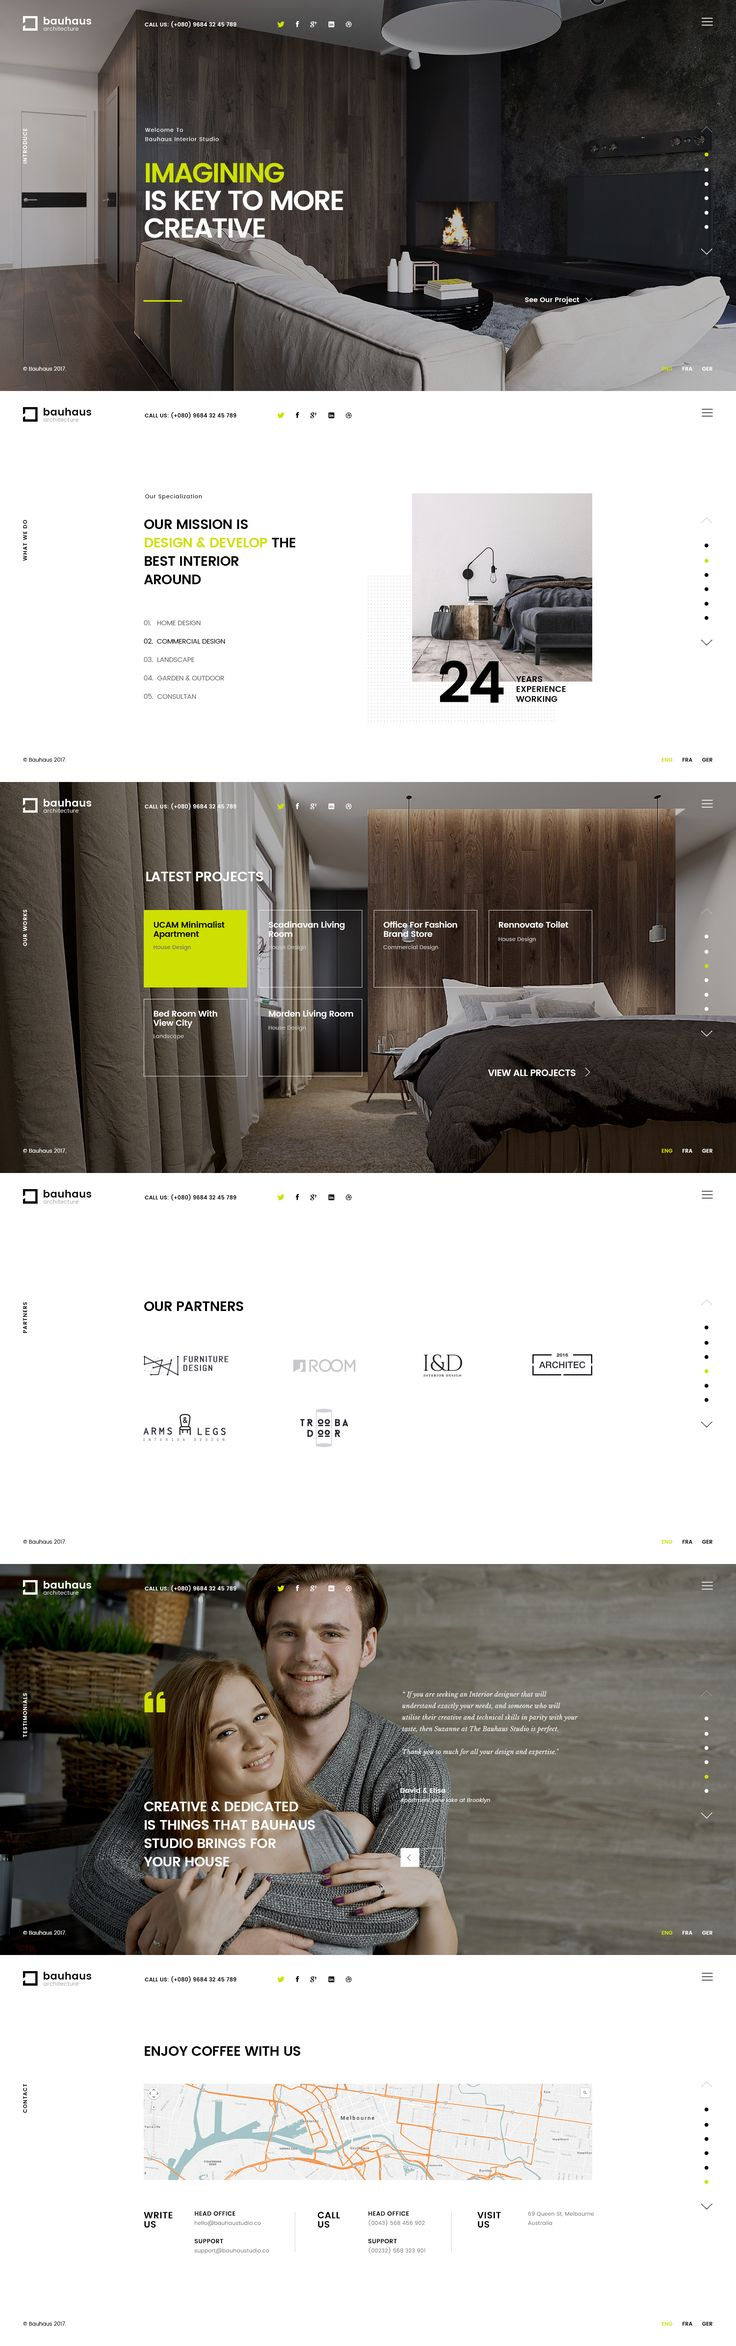 Bauhaus | Architecture & Interior Studio by Logan Cee | dribbble